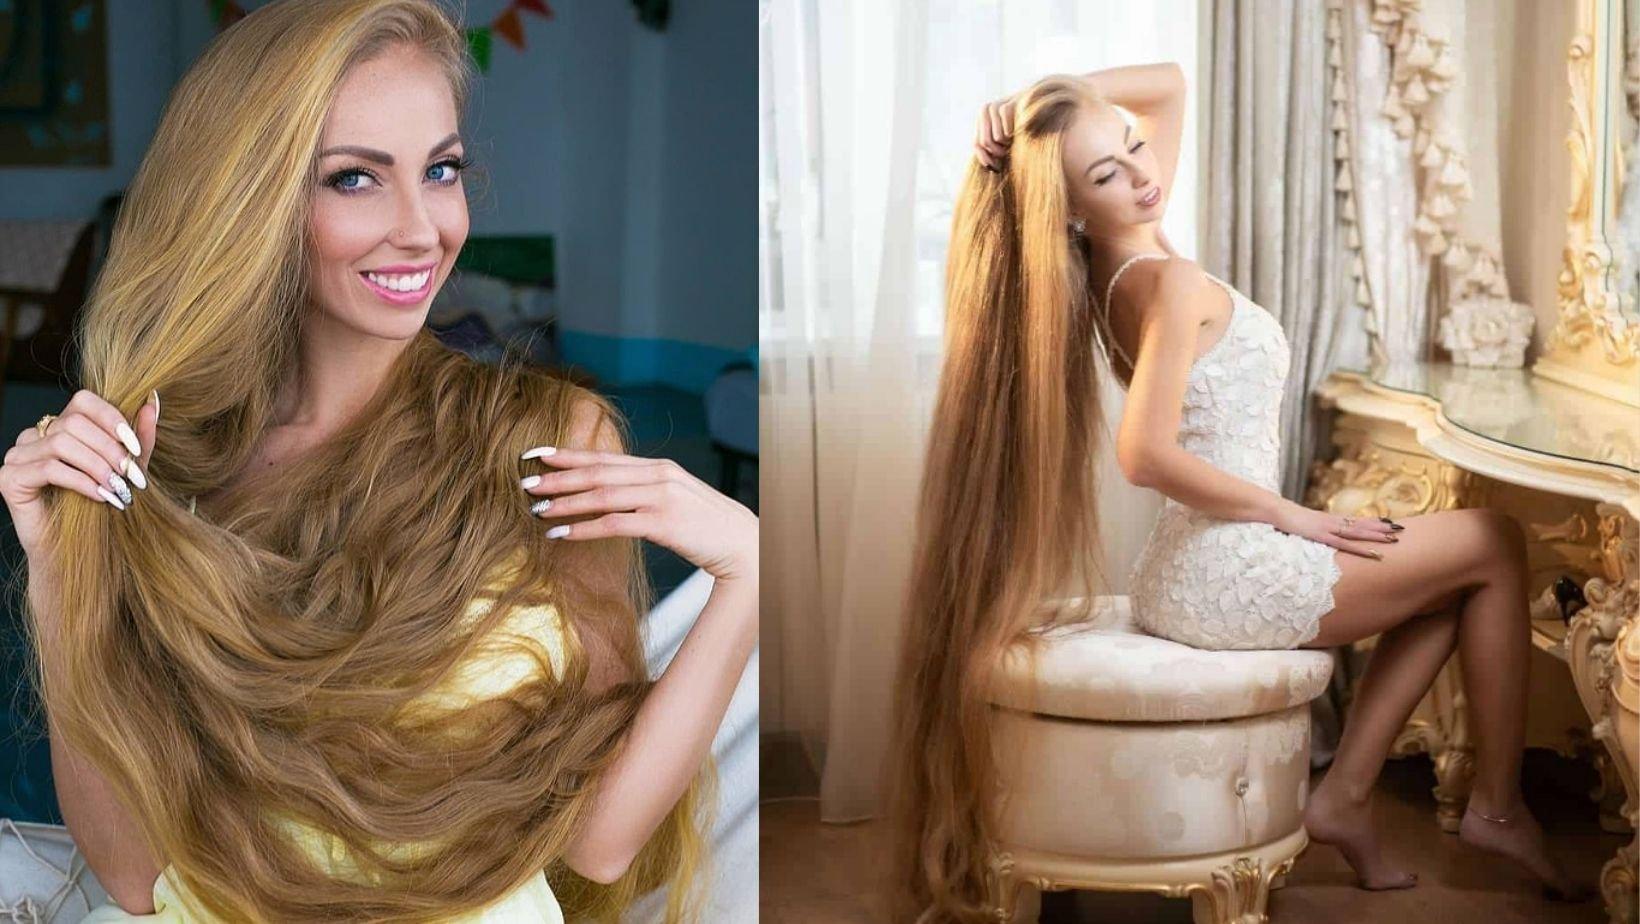 1 77.jpg?resize=1200,630 - Real Life Rapunzel Grows Her Hair  As She Believes Long Blonde Locks Attract Men More